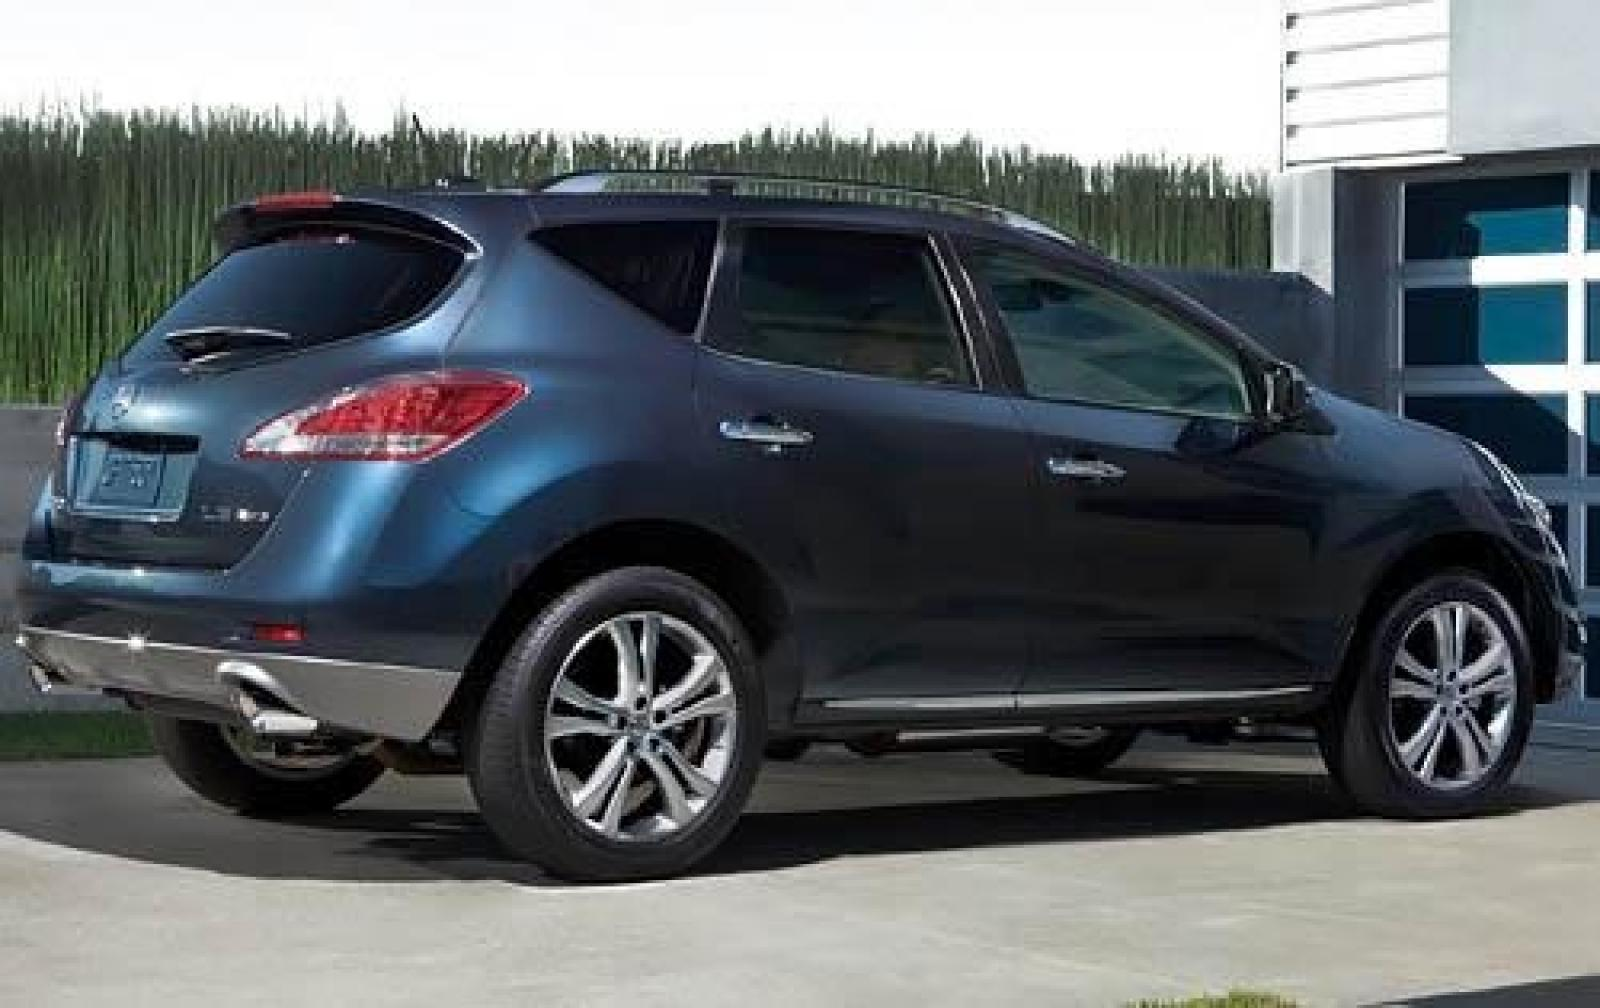 800 1024 1280 1600 Origin 2011 Nissan ...